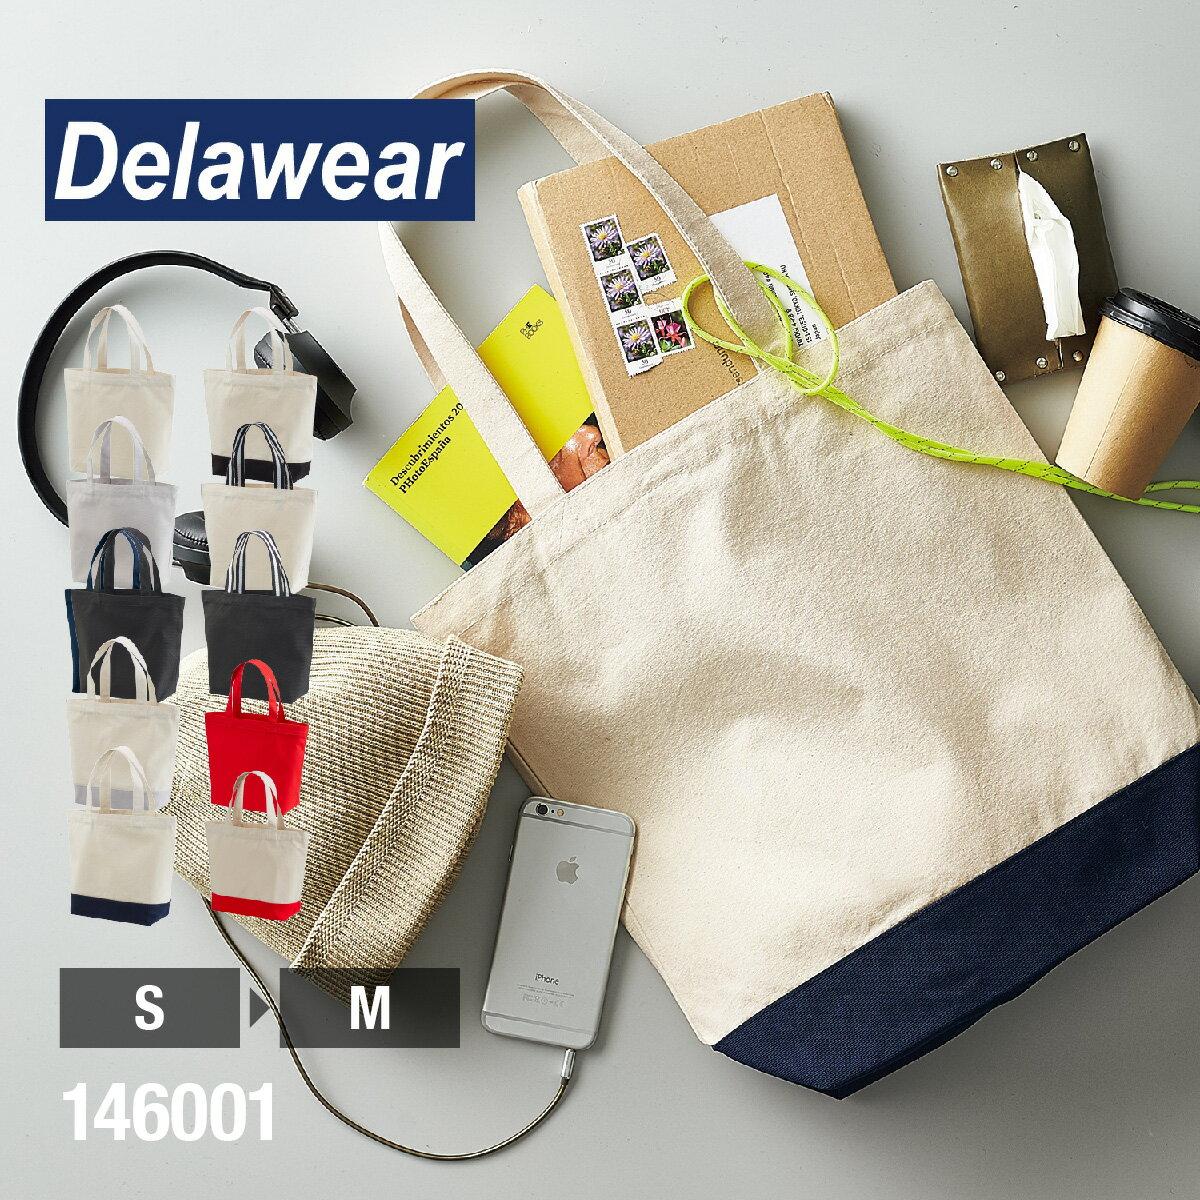 deslawear(デラウェア) レギュラーキャンバストートバッグ 146001